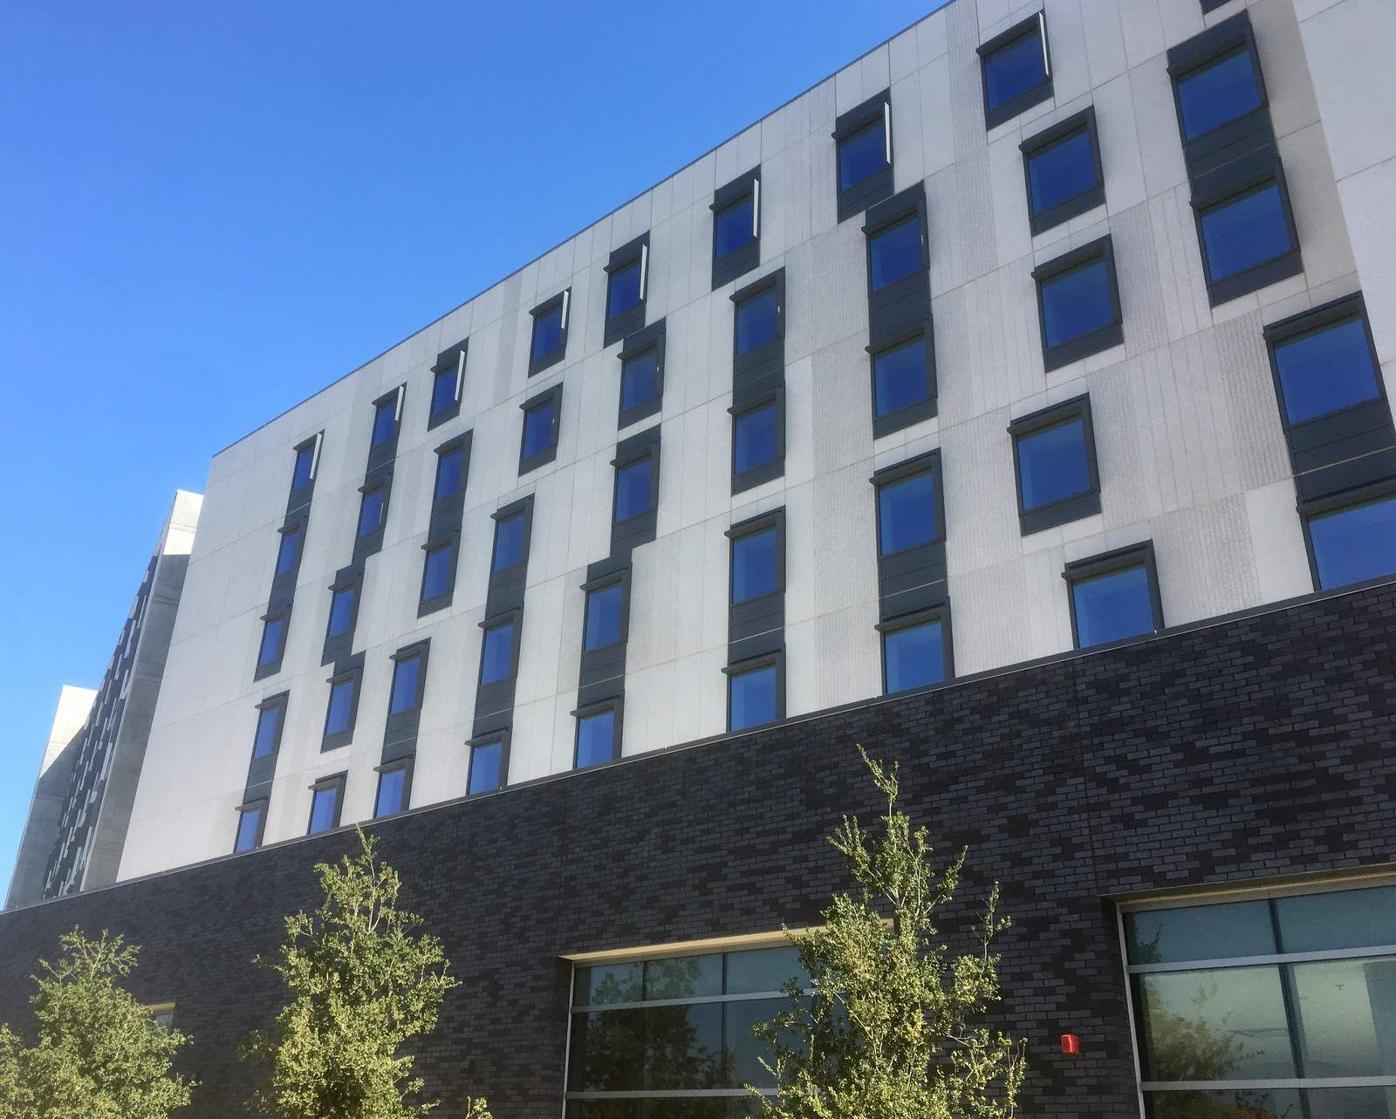 New Cal State LA dorm building